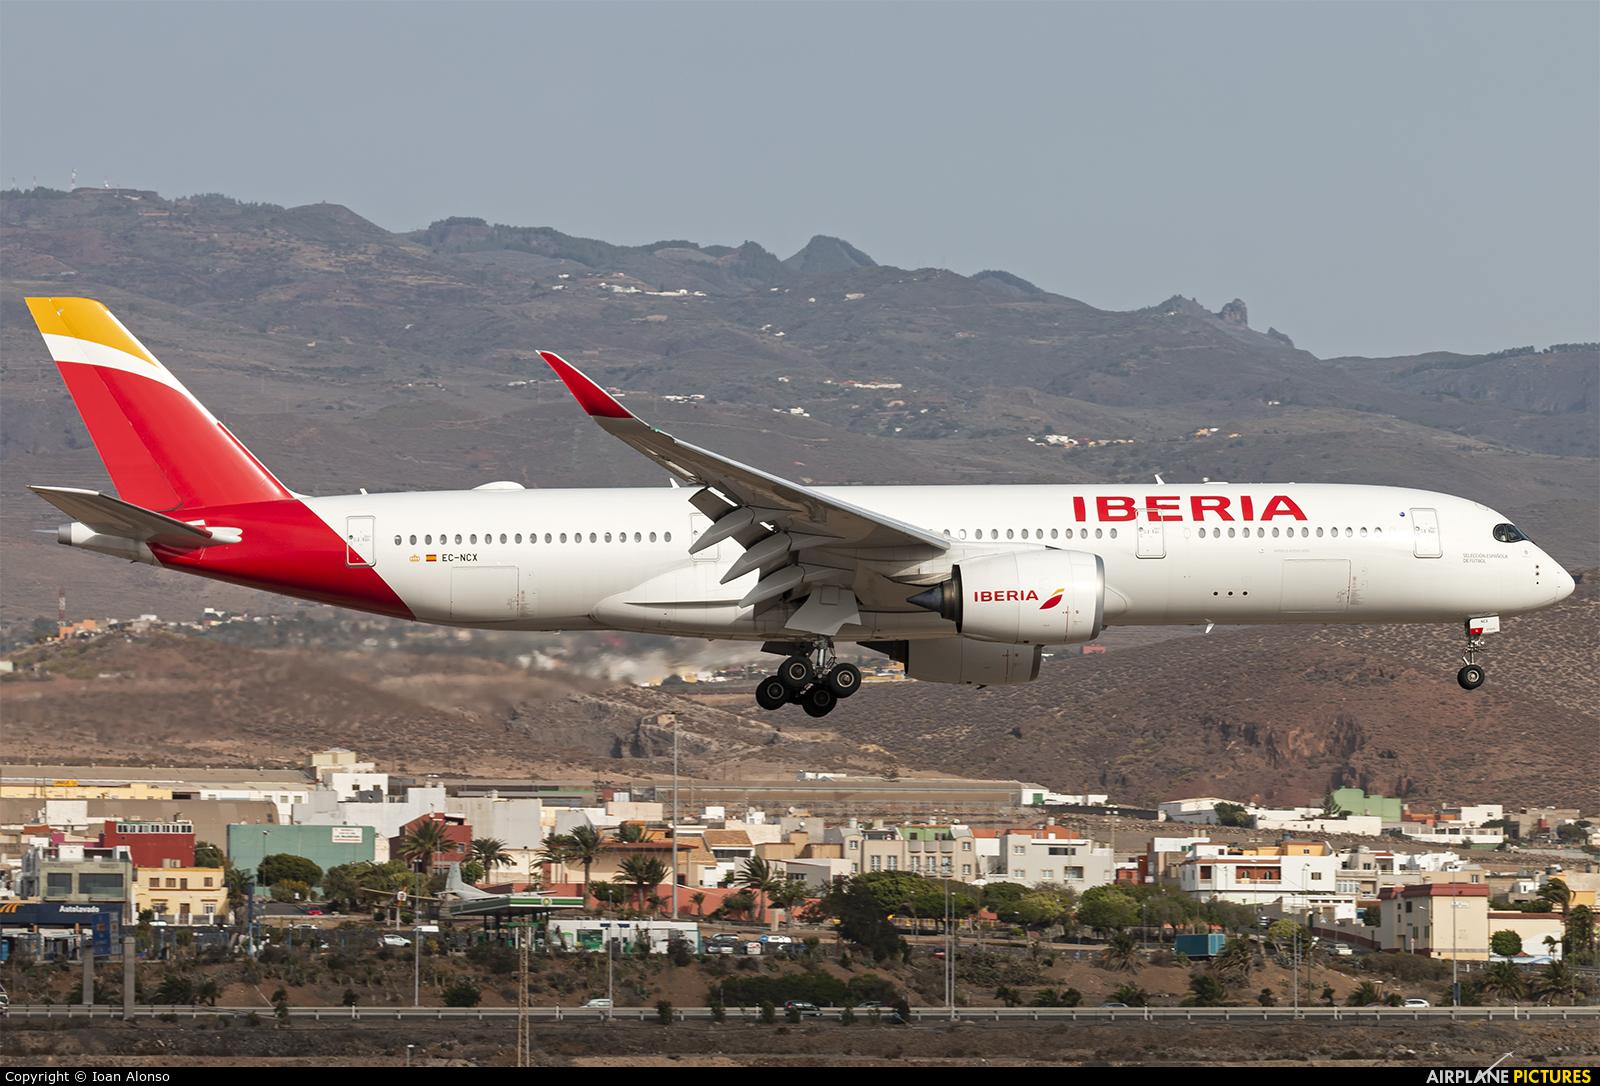 Iberia EC-NCX aircraft at Aeropuerto de Gran Canaria